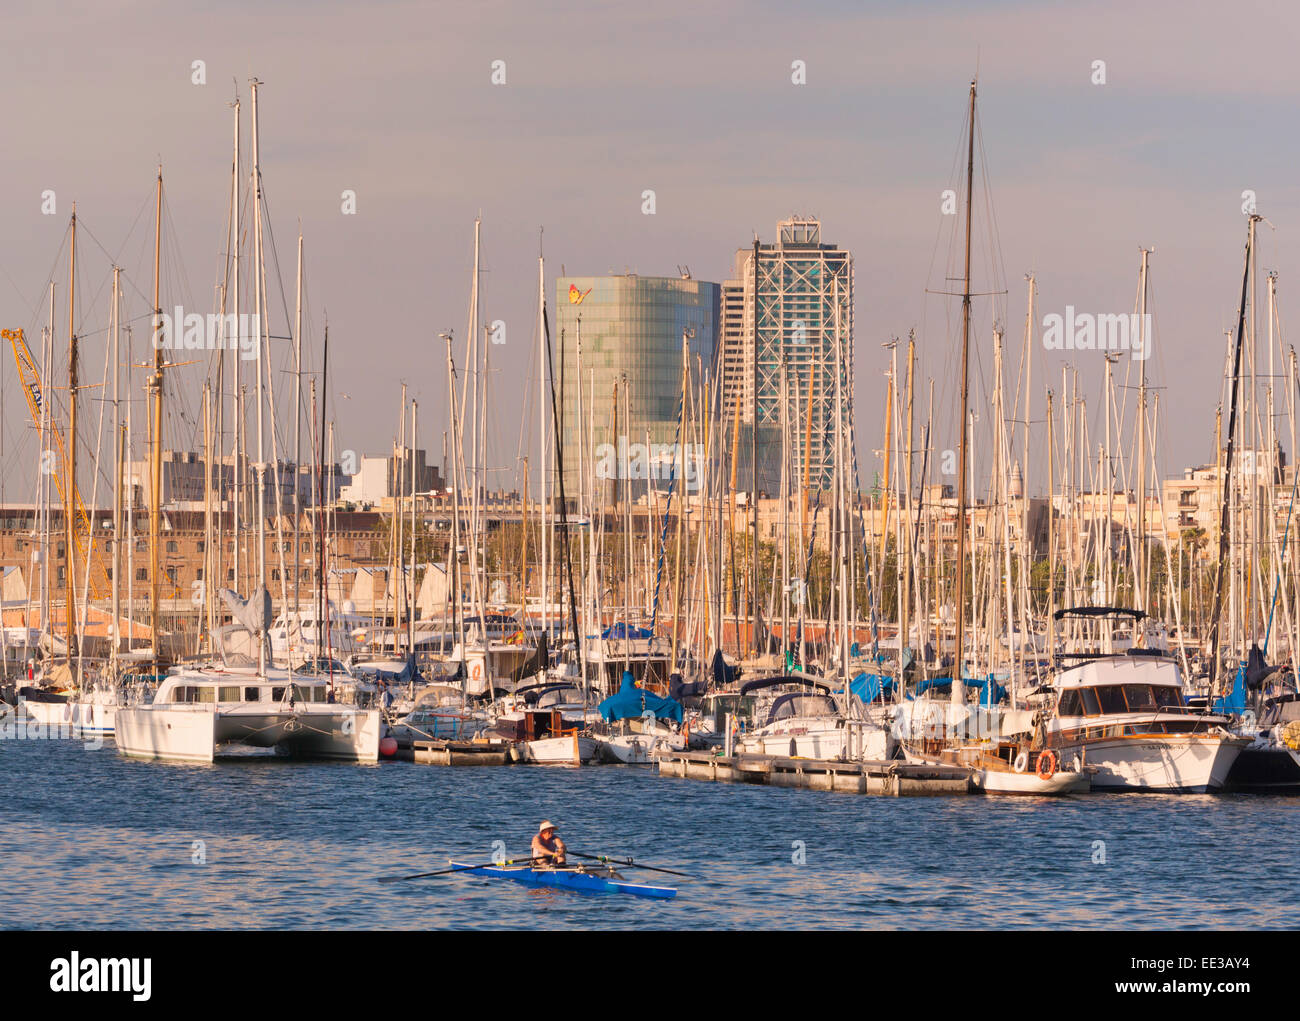 Barcelona, Spain.  Man sculling amongst luxury yachts in Port Vell. - Stock Image